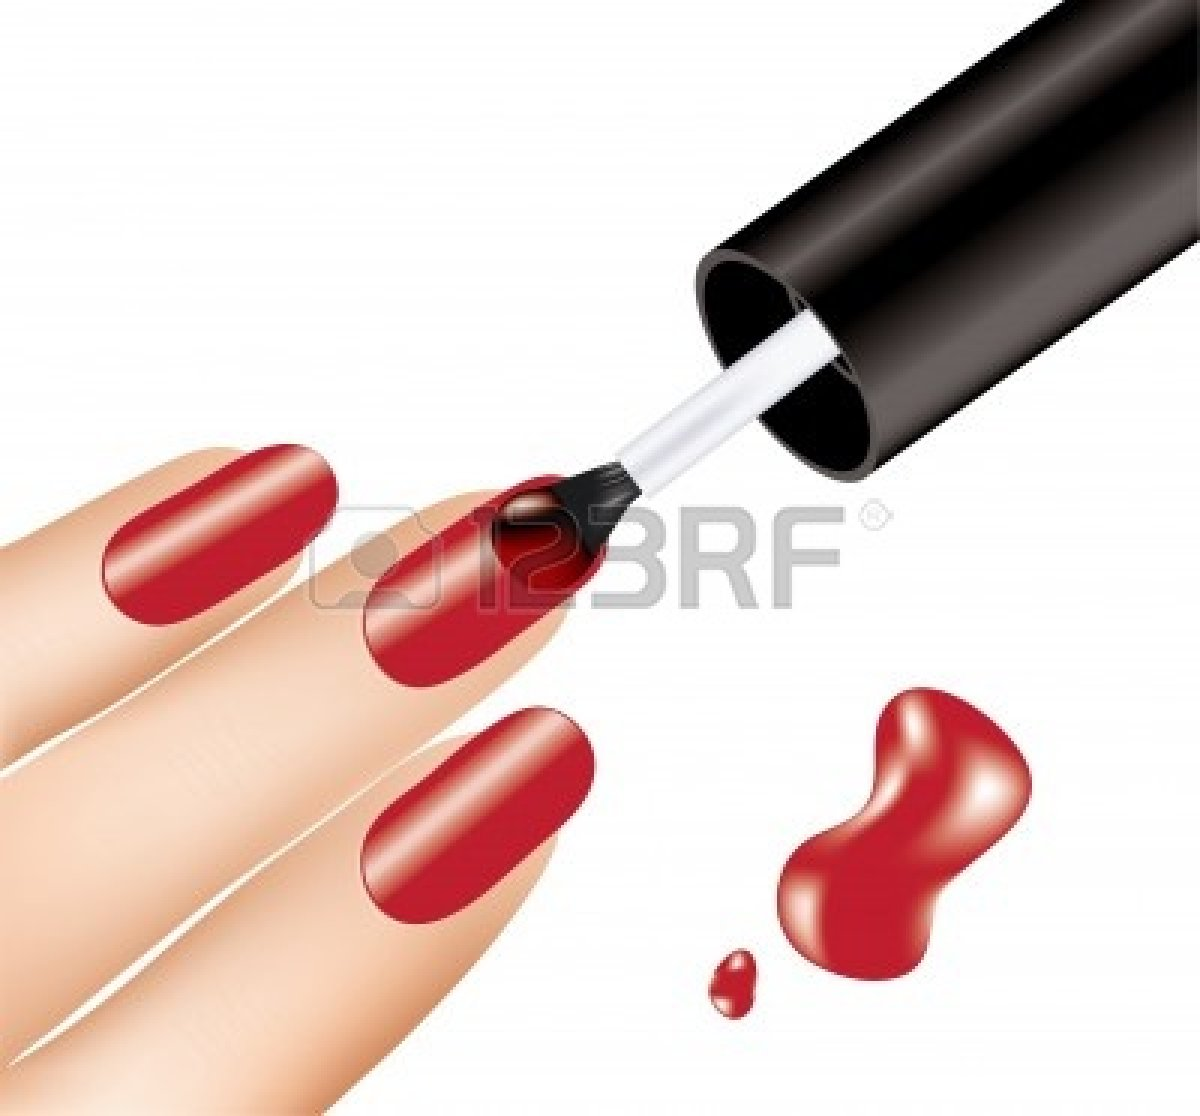 Red Nail Polish On Thumb: Clipart Panda - Free Clipart Images